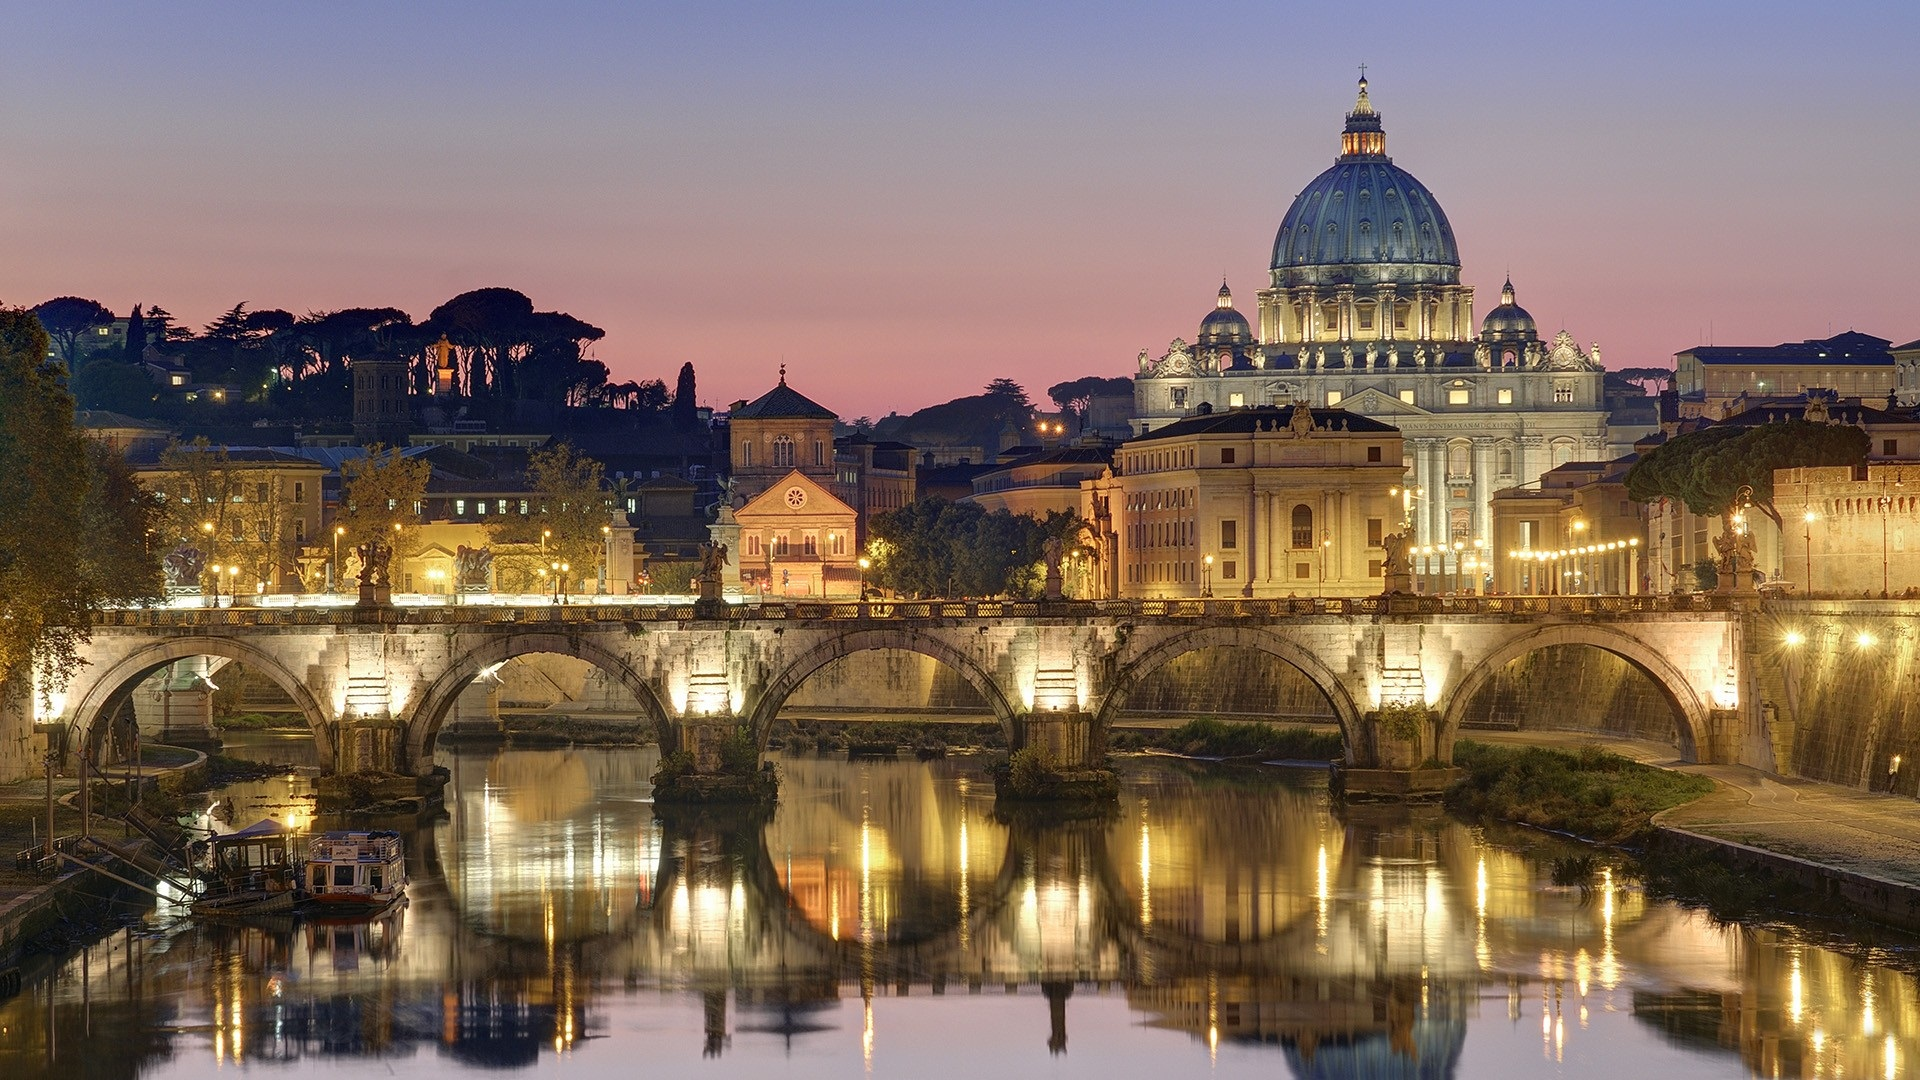 دانلود پروژه پاورپوینت معماری صدر مسیحیت